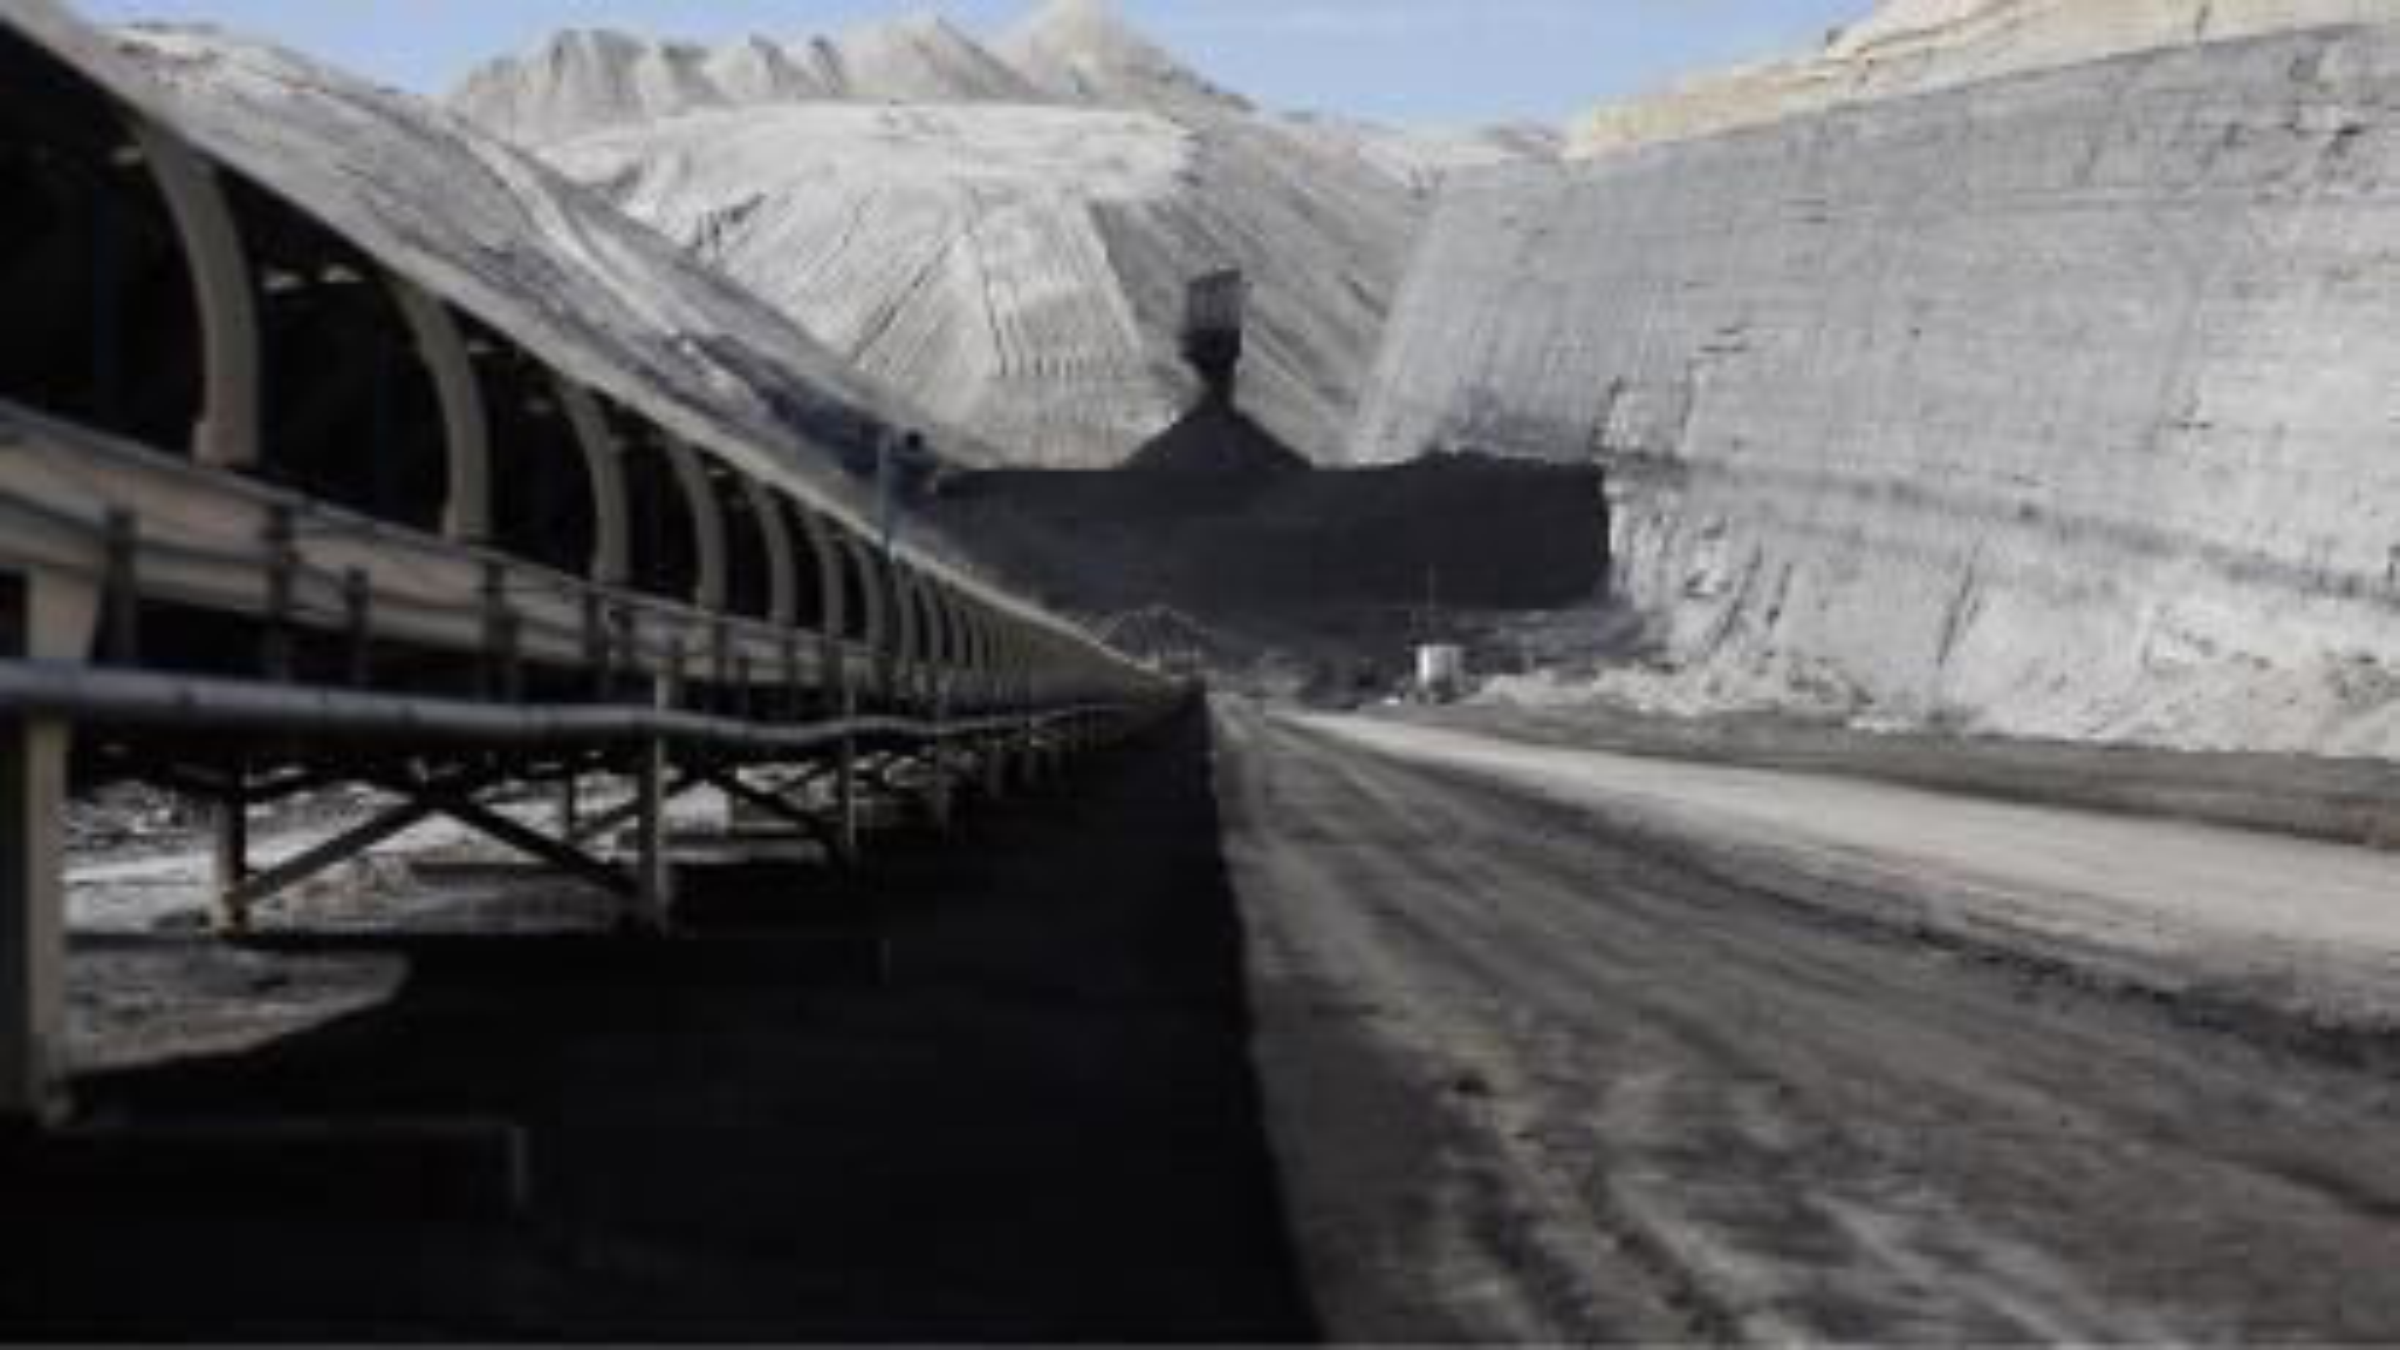 The Jim Bridger coal mine in Wyoming.